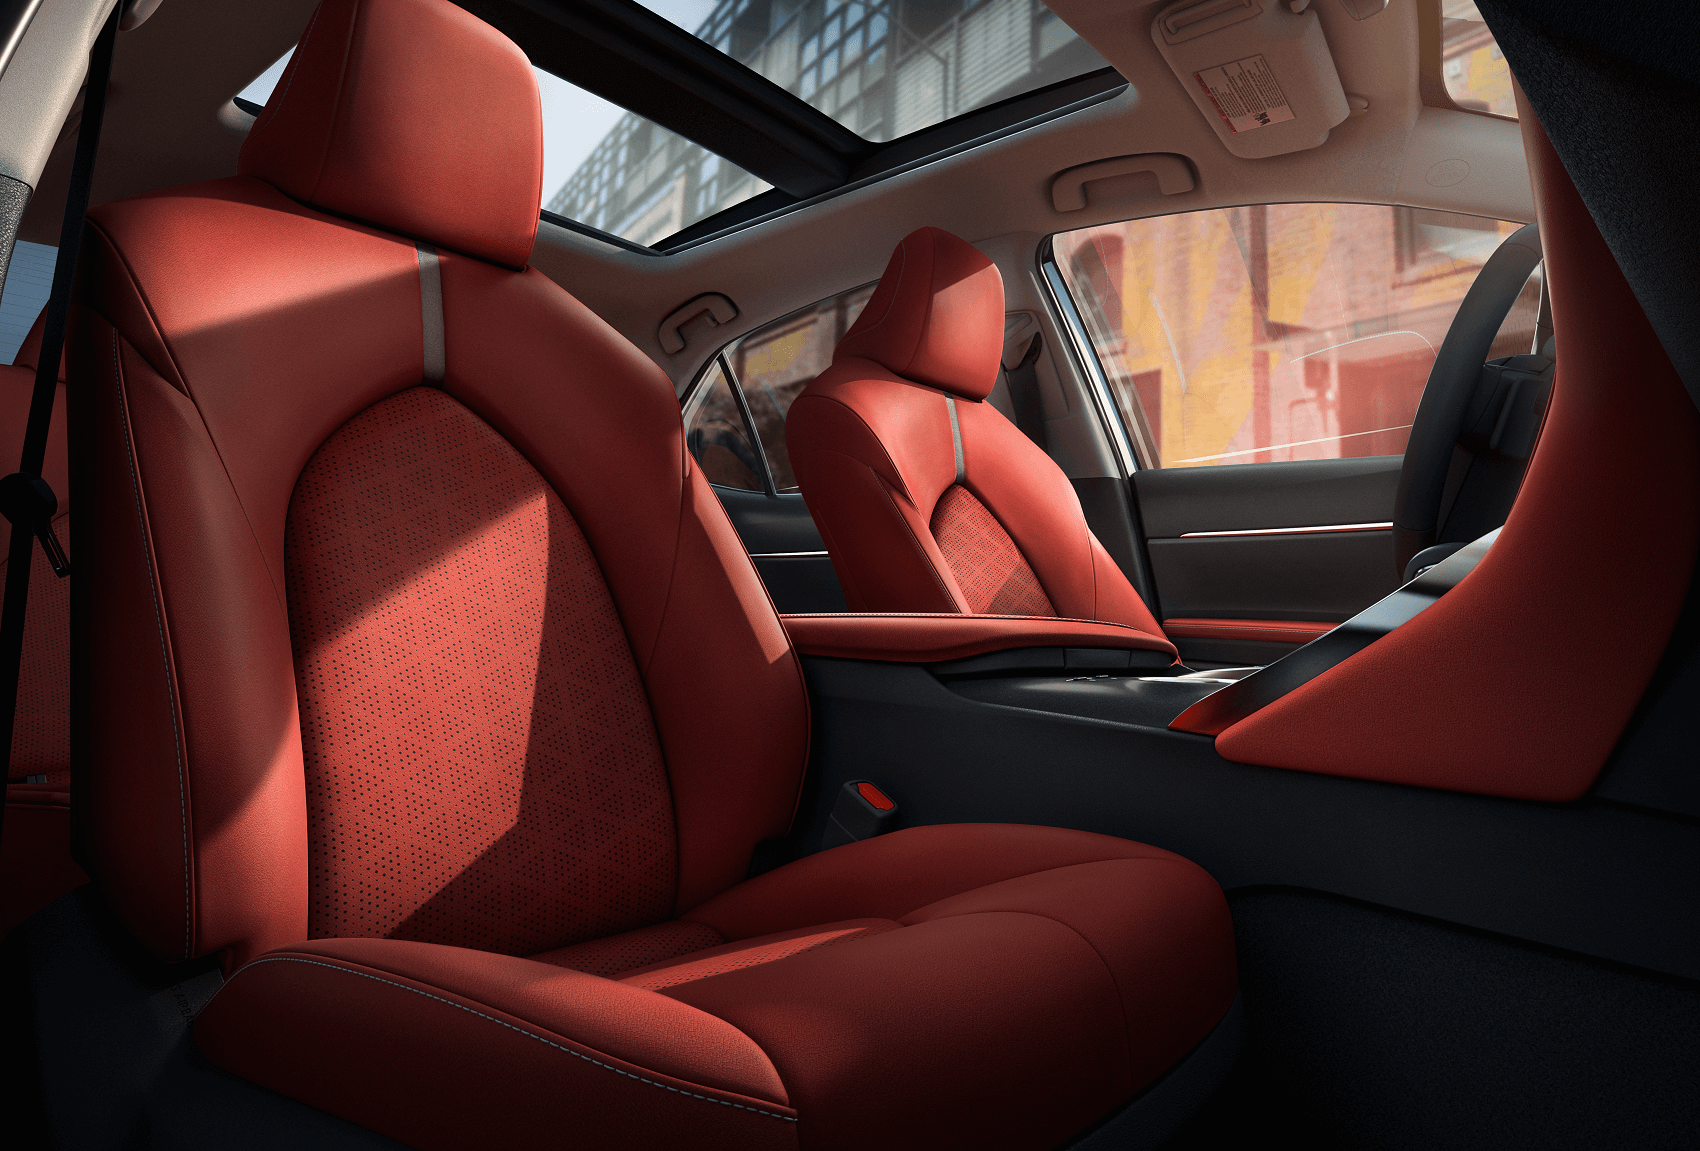 2021 Toyota Camry Interior Madisonville KY